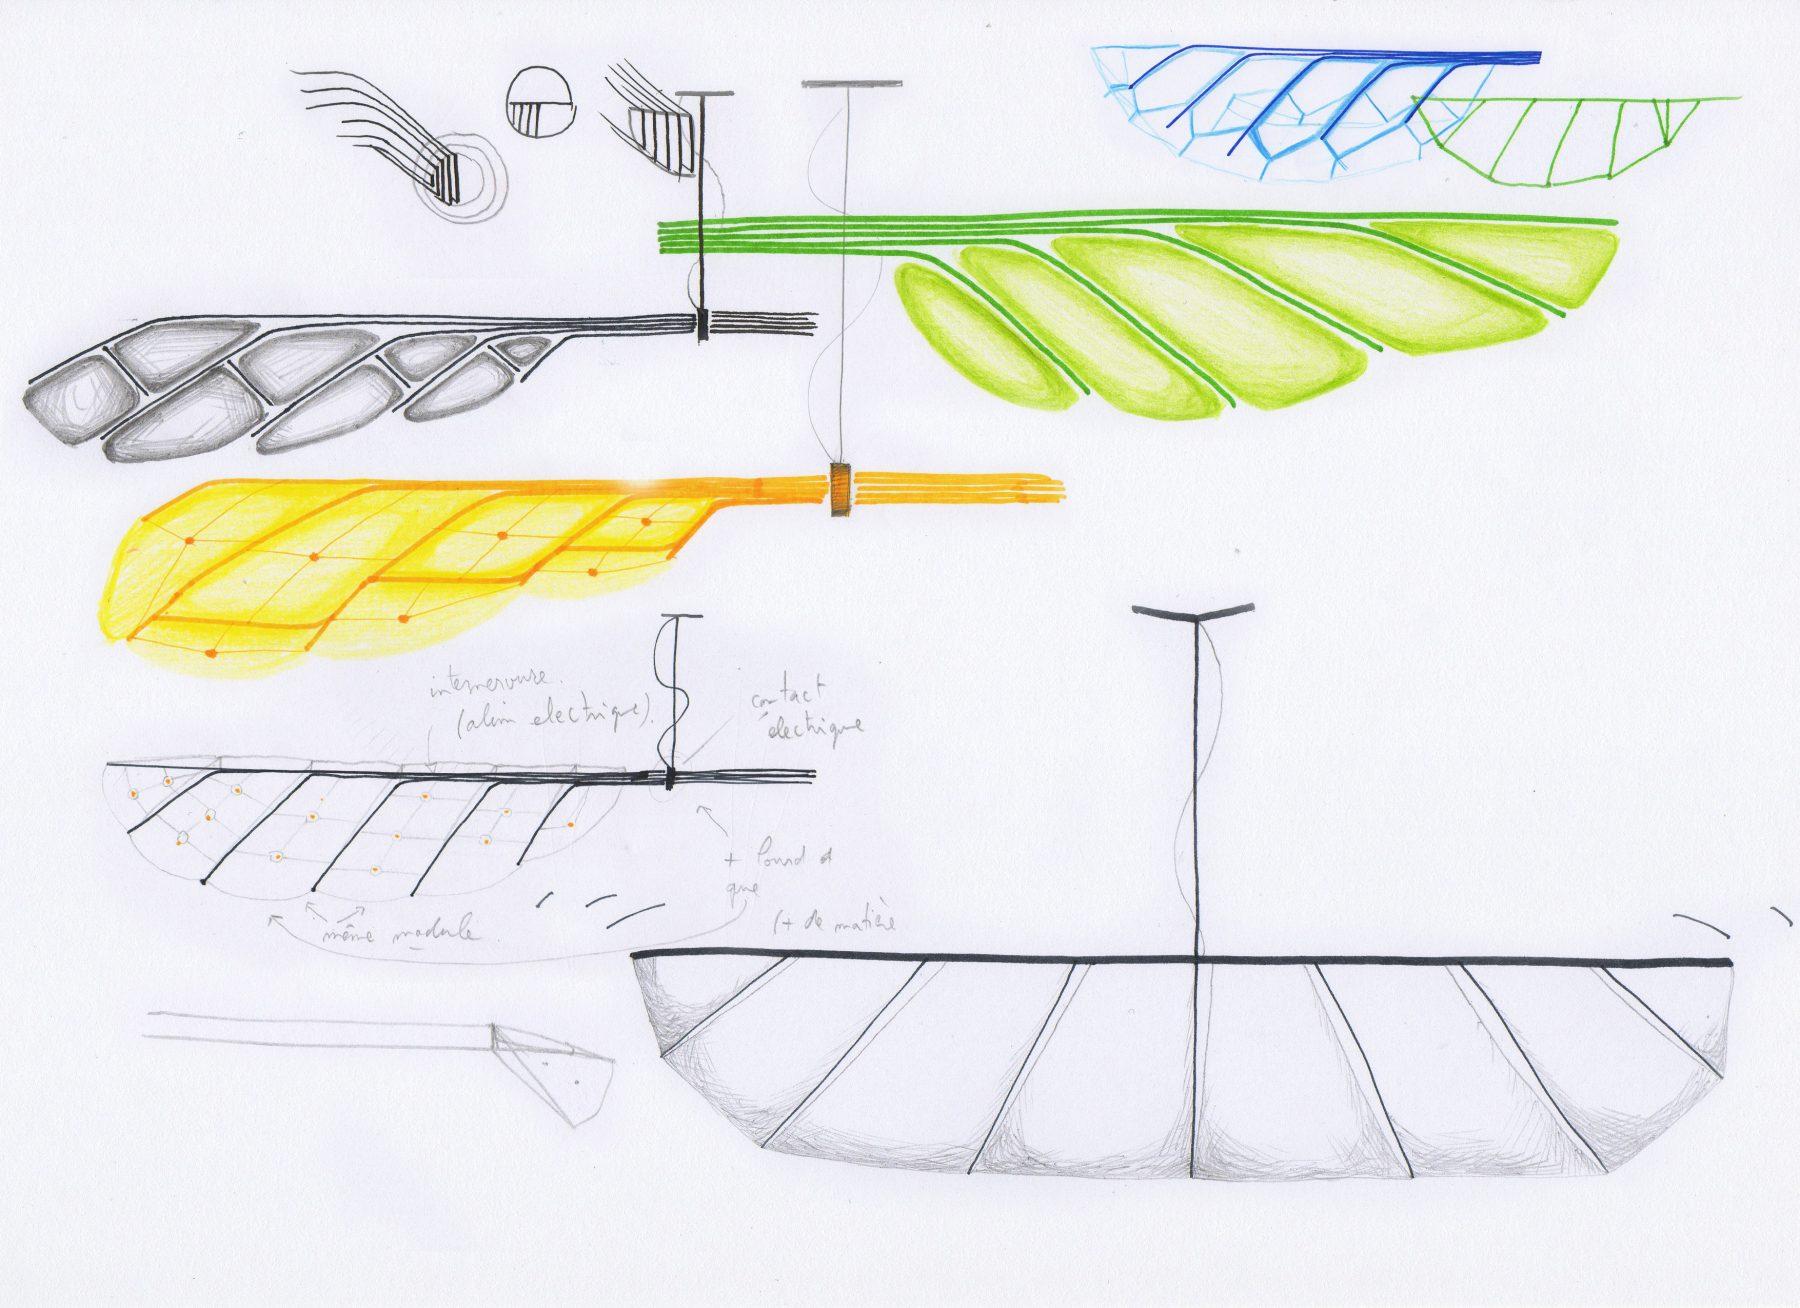 PLUME light - Sketches - Aide à projet VIA 2013 - design by bold - photo Marie Flores - www.bold-design.fr